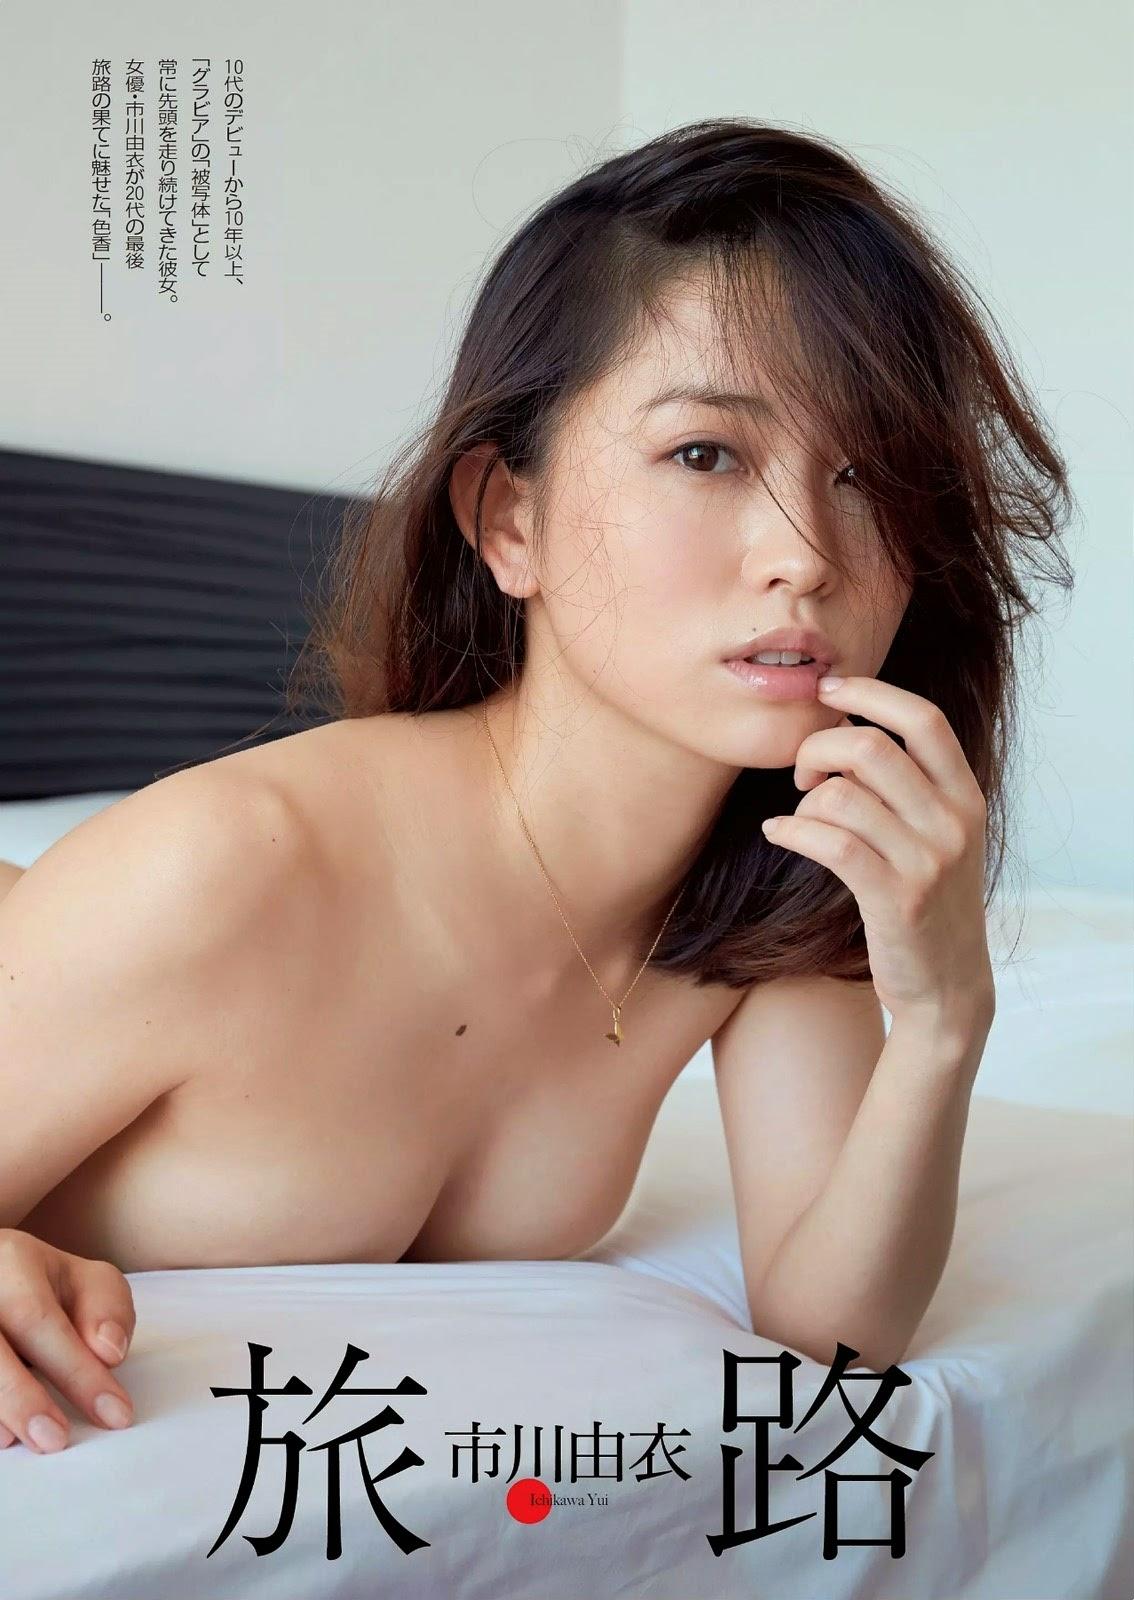 Yui Ichikawa 市川由衣 Weekly Playboy March 2015 Photos